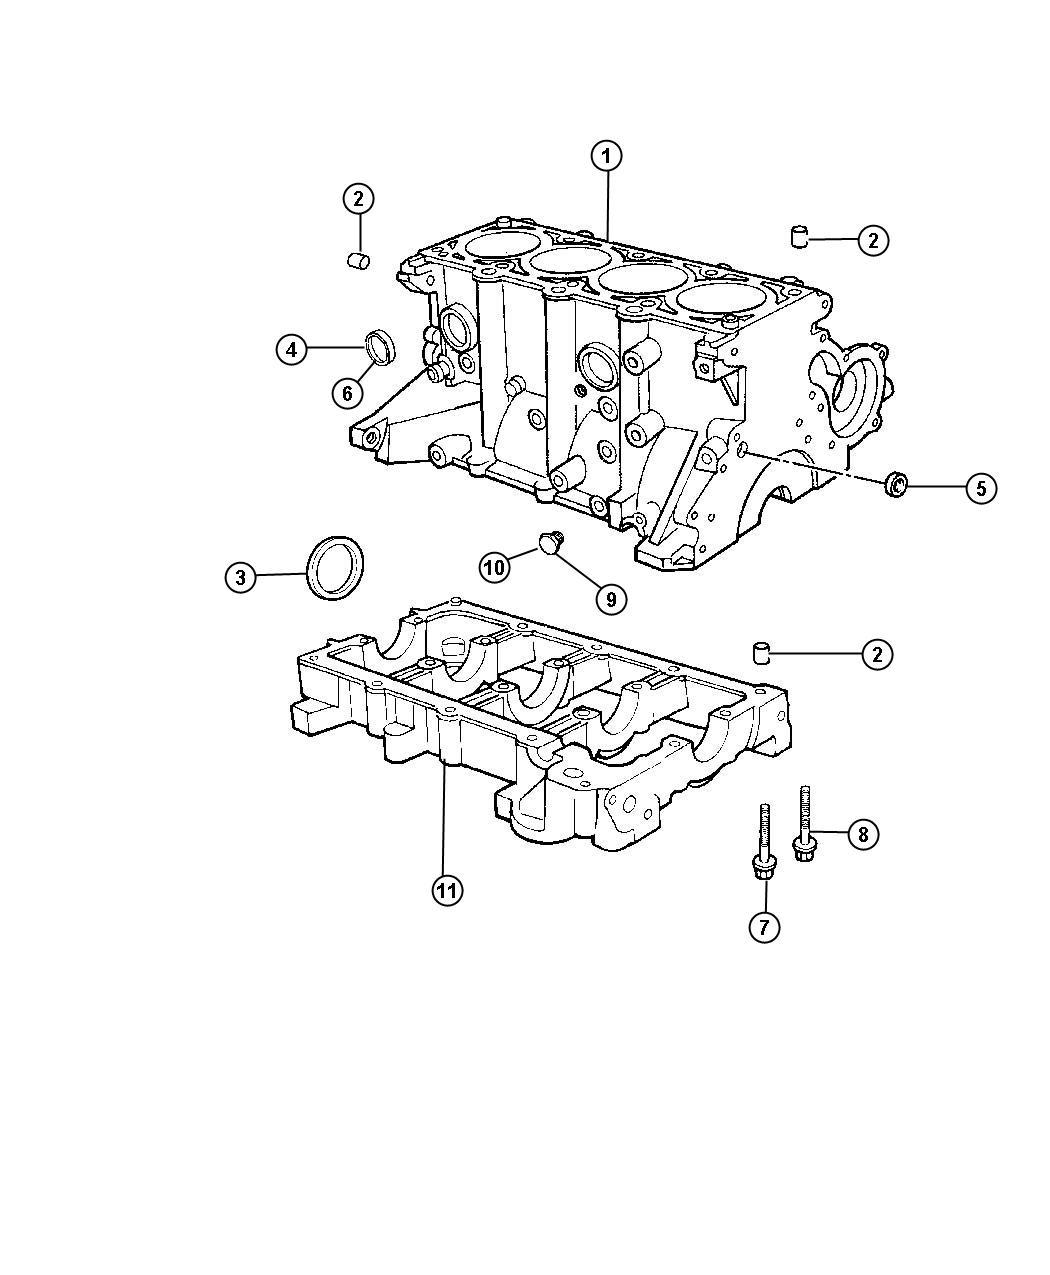 Chrysler Pt Cruiser Dowel Dowel Pin Engine Block To